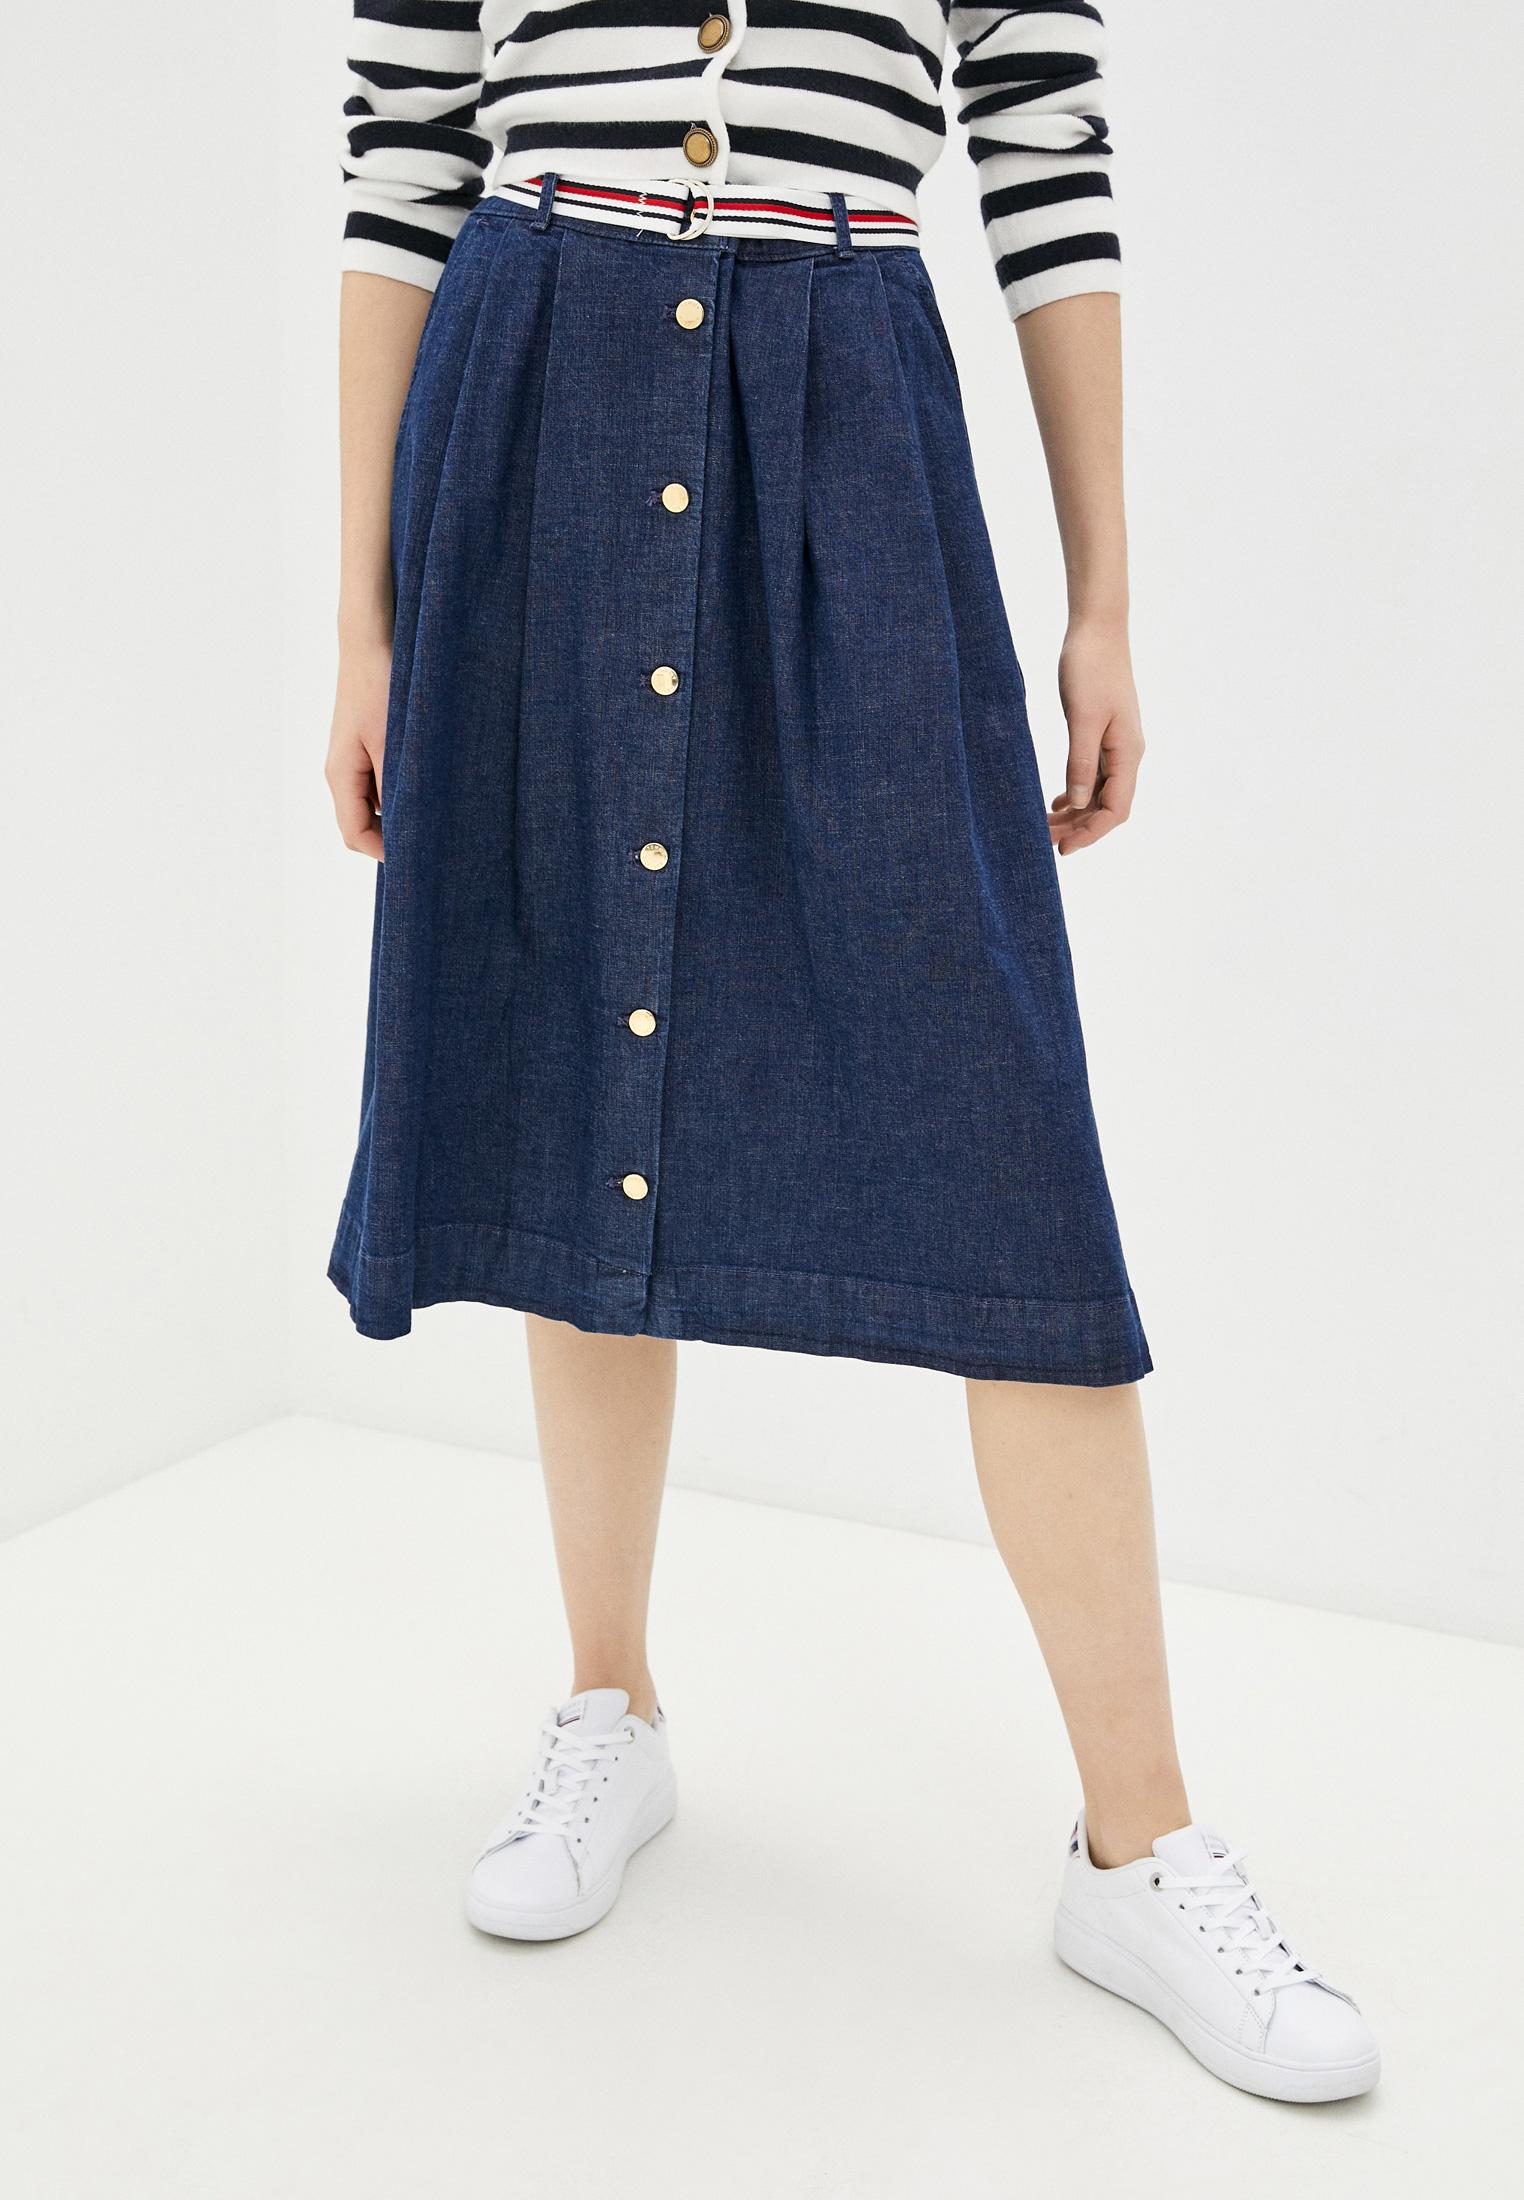 Джинсовая юбка Tommy Hilfiger (Томми Хилфигер) WW0WW30312